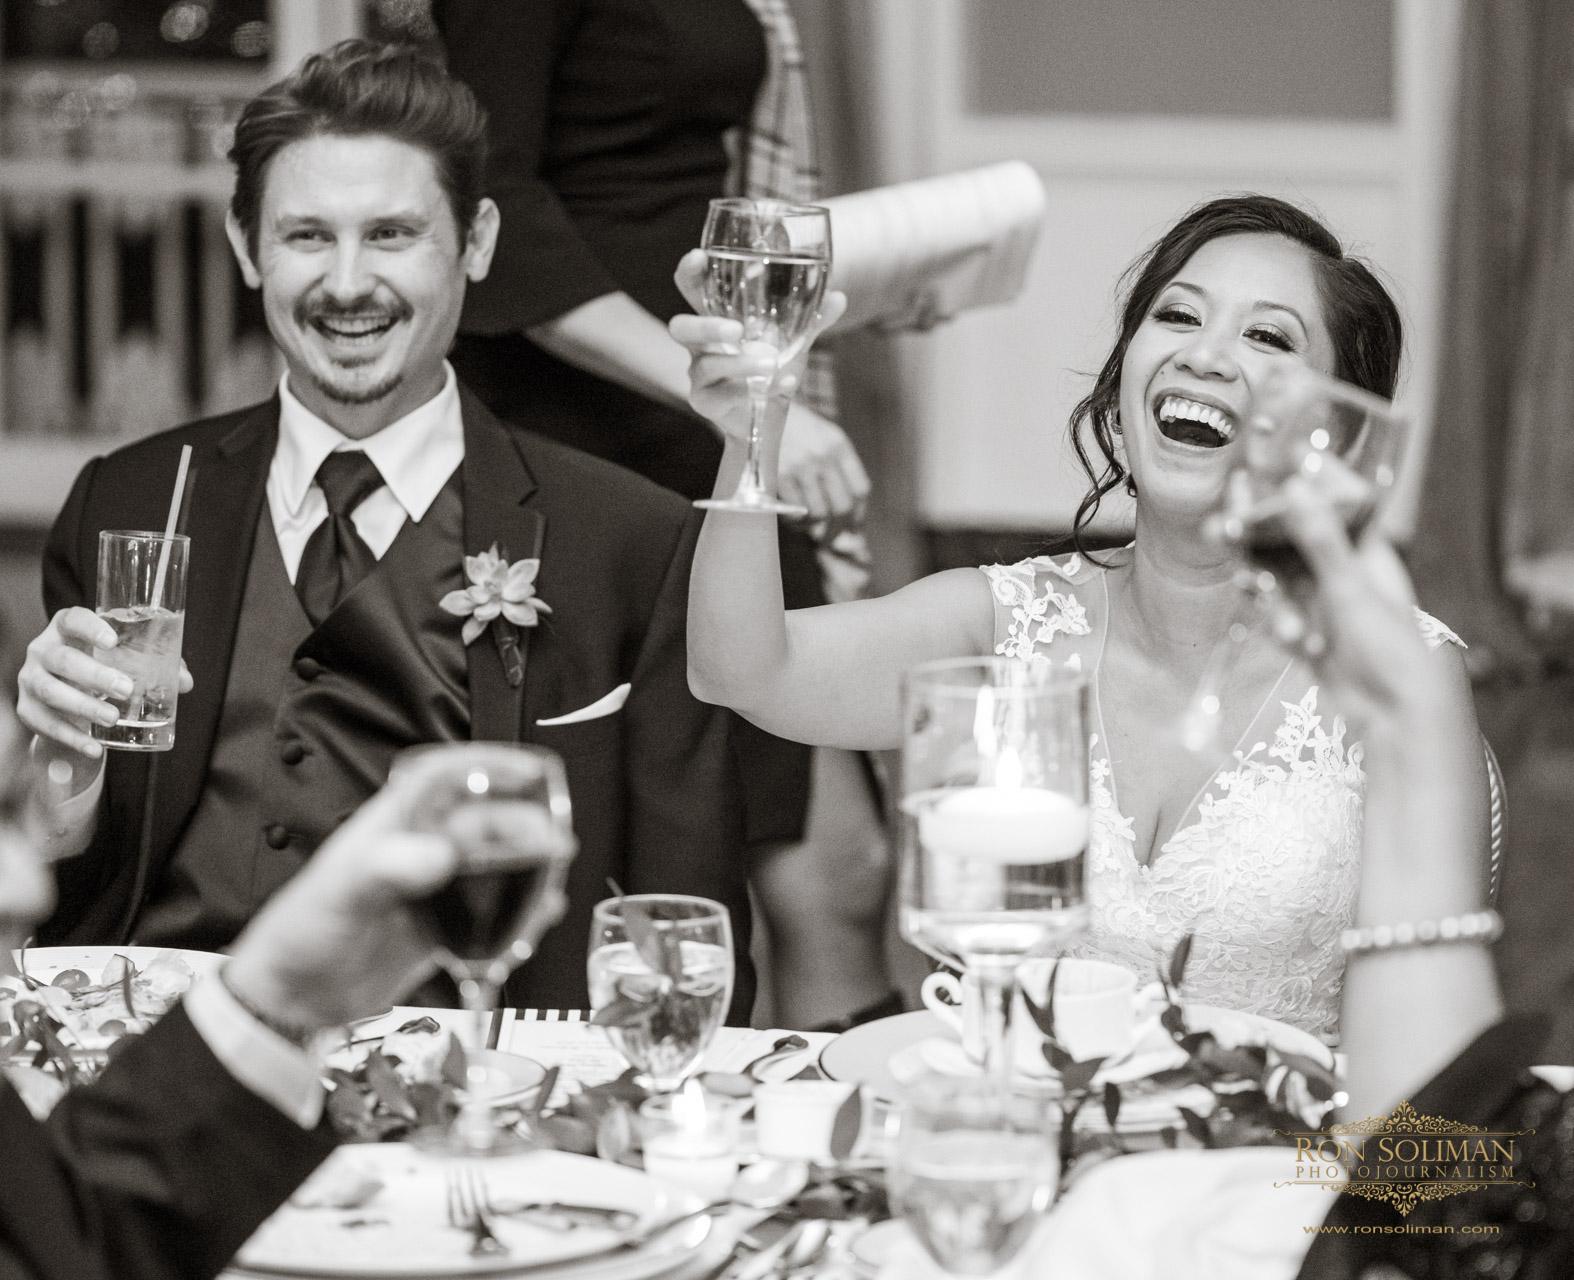 THE GREENBRIER RESORT WEDDING 45